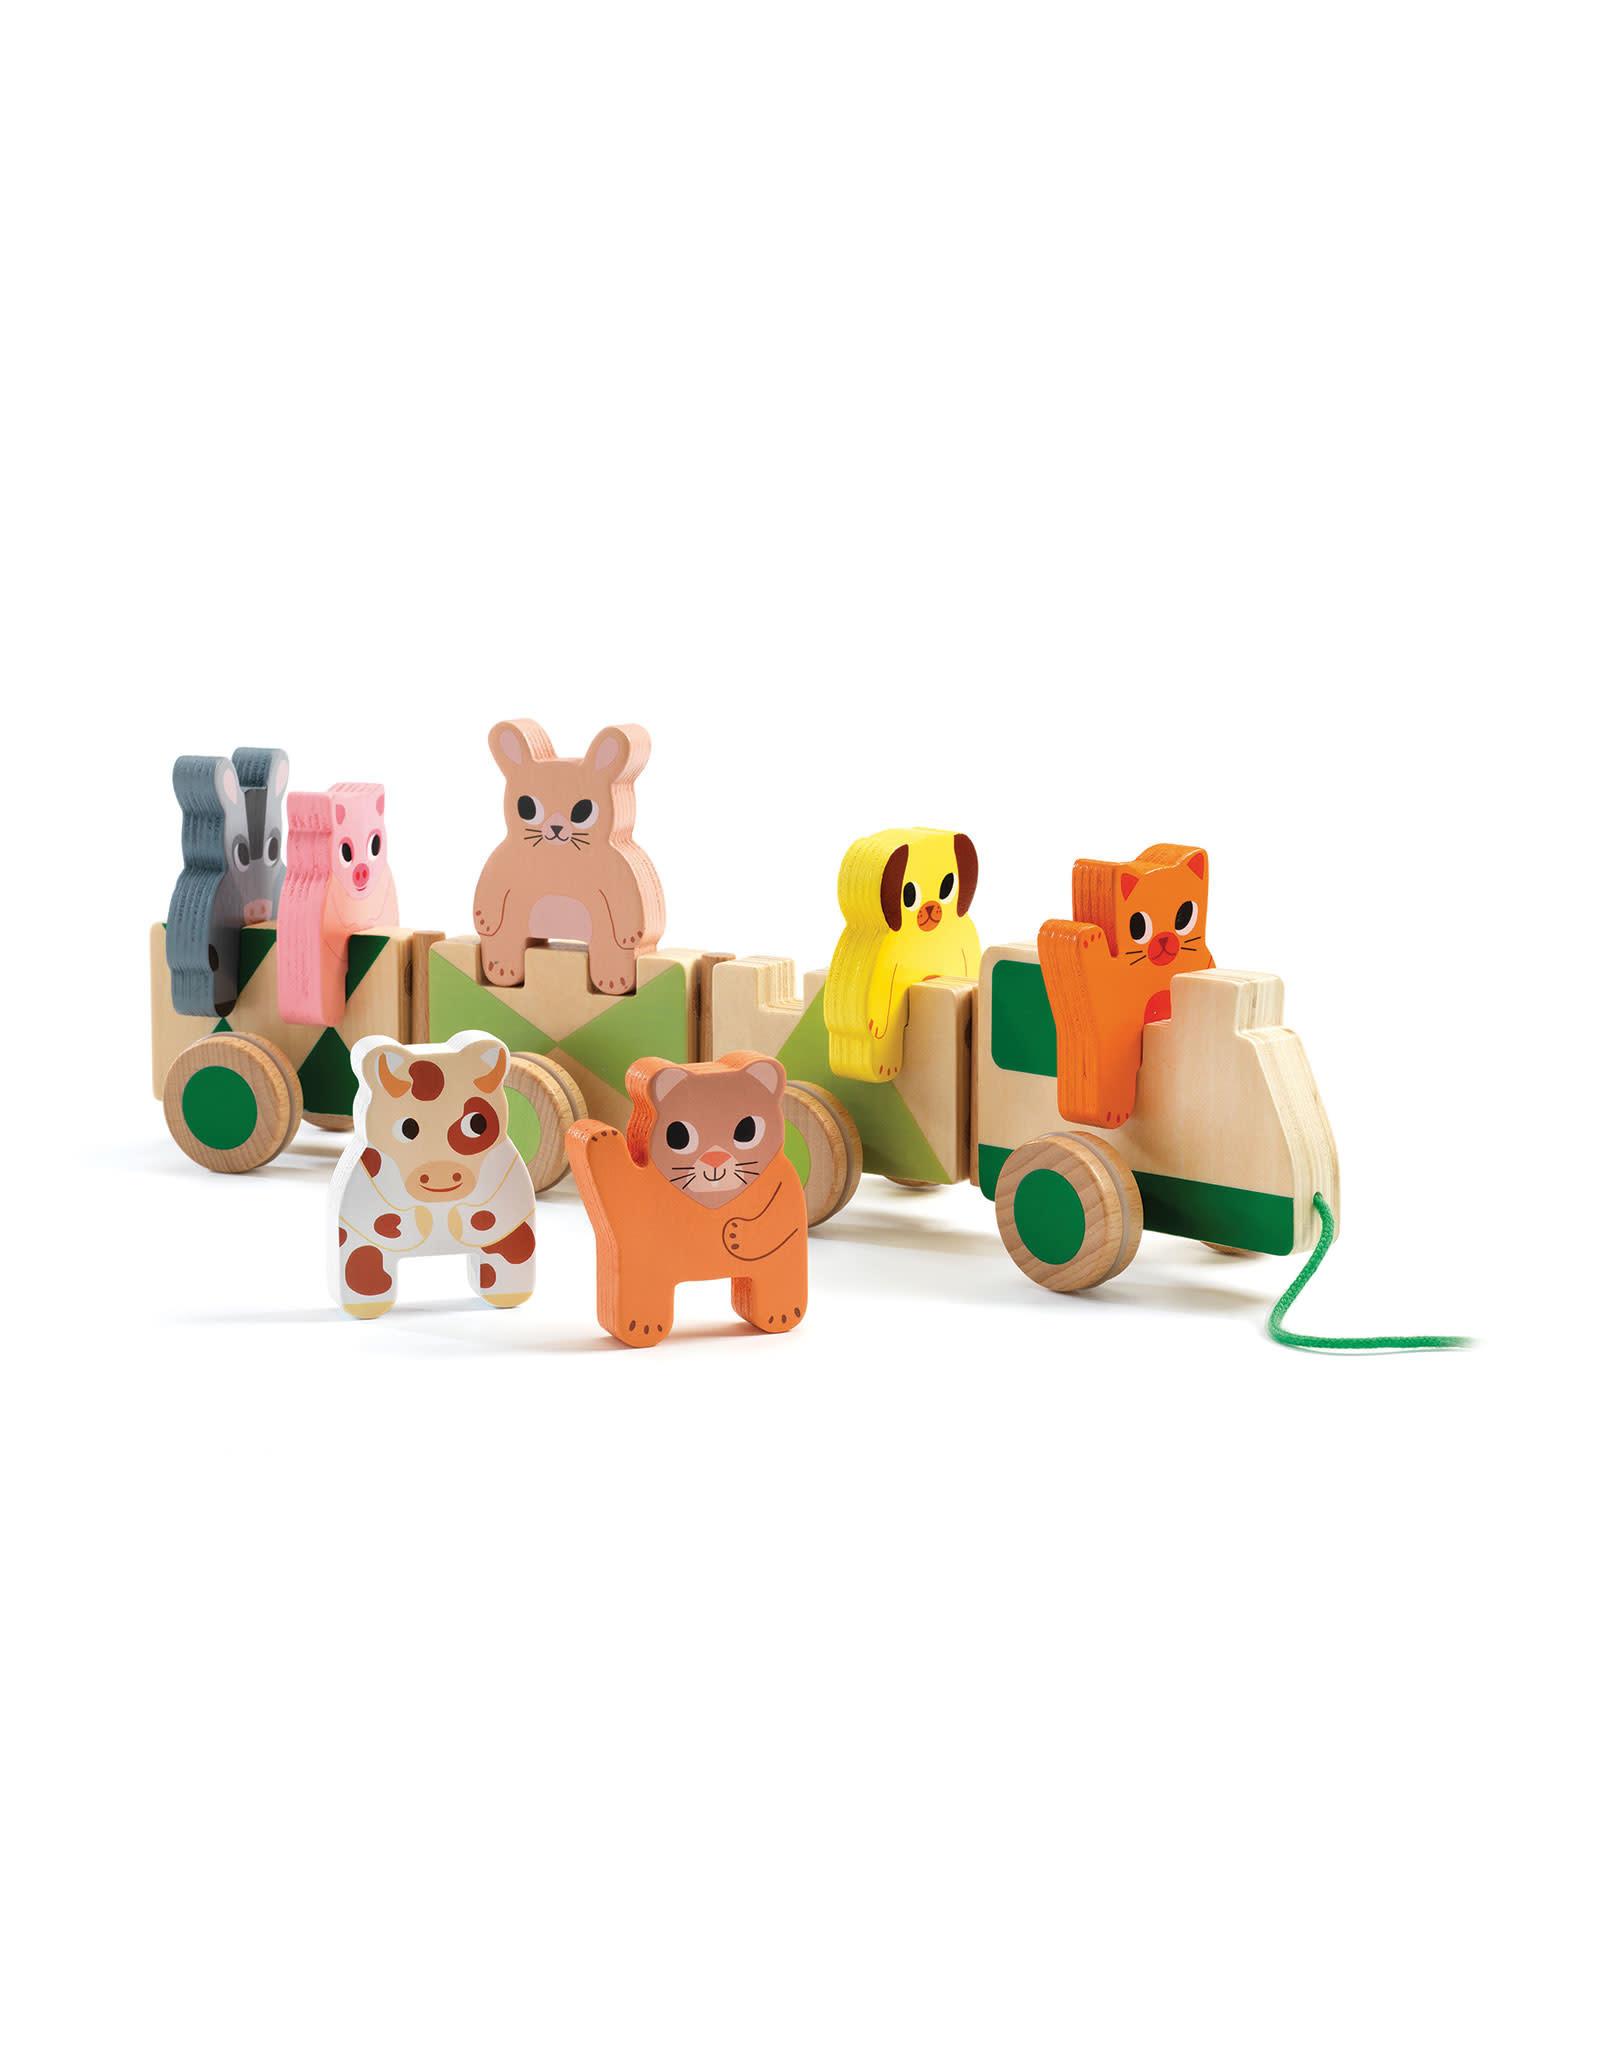 Djeco Pull Along Toy - Trainimo Farm